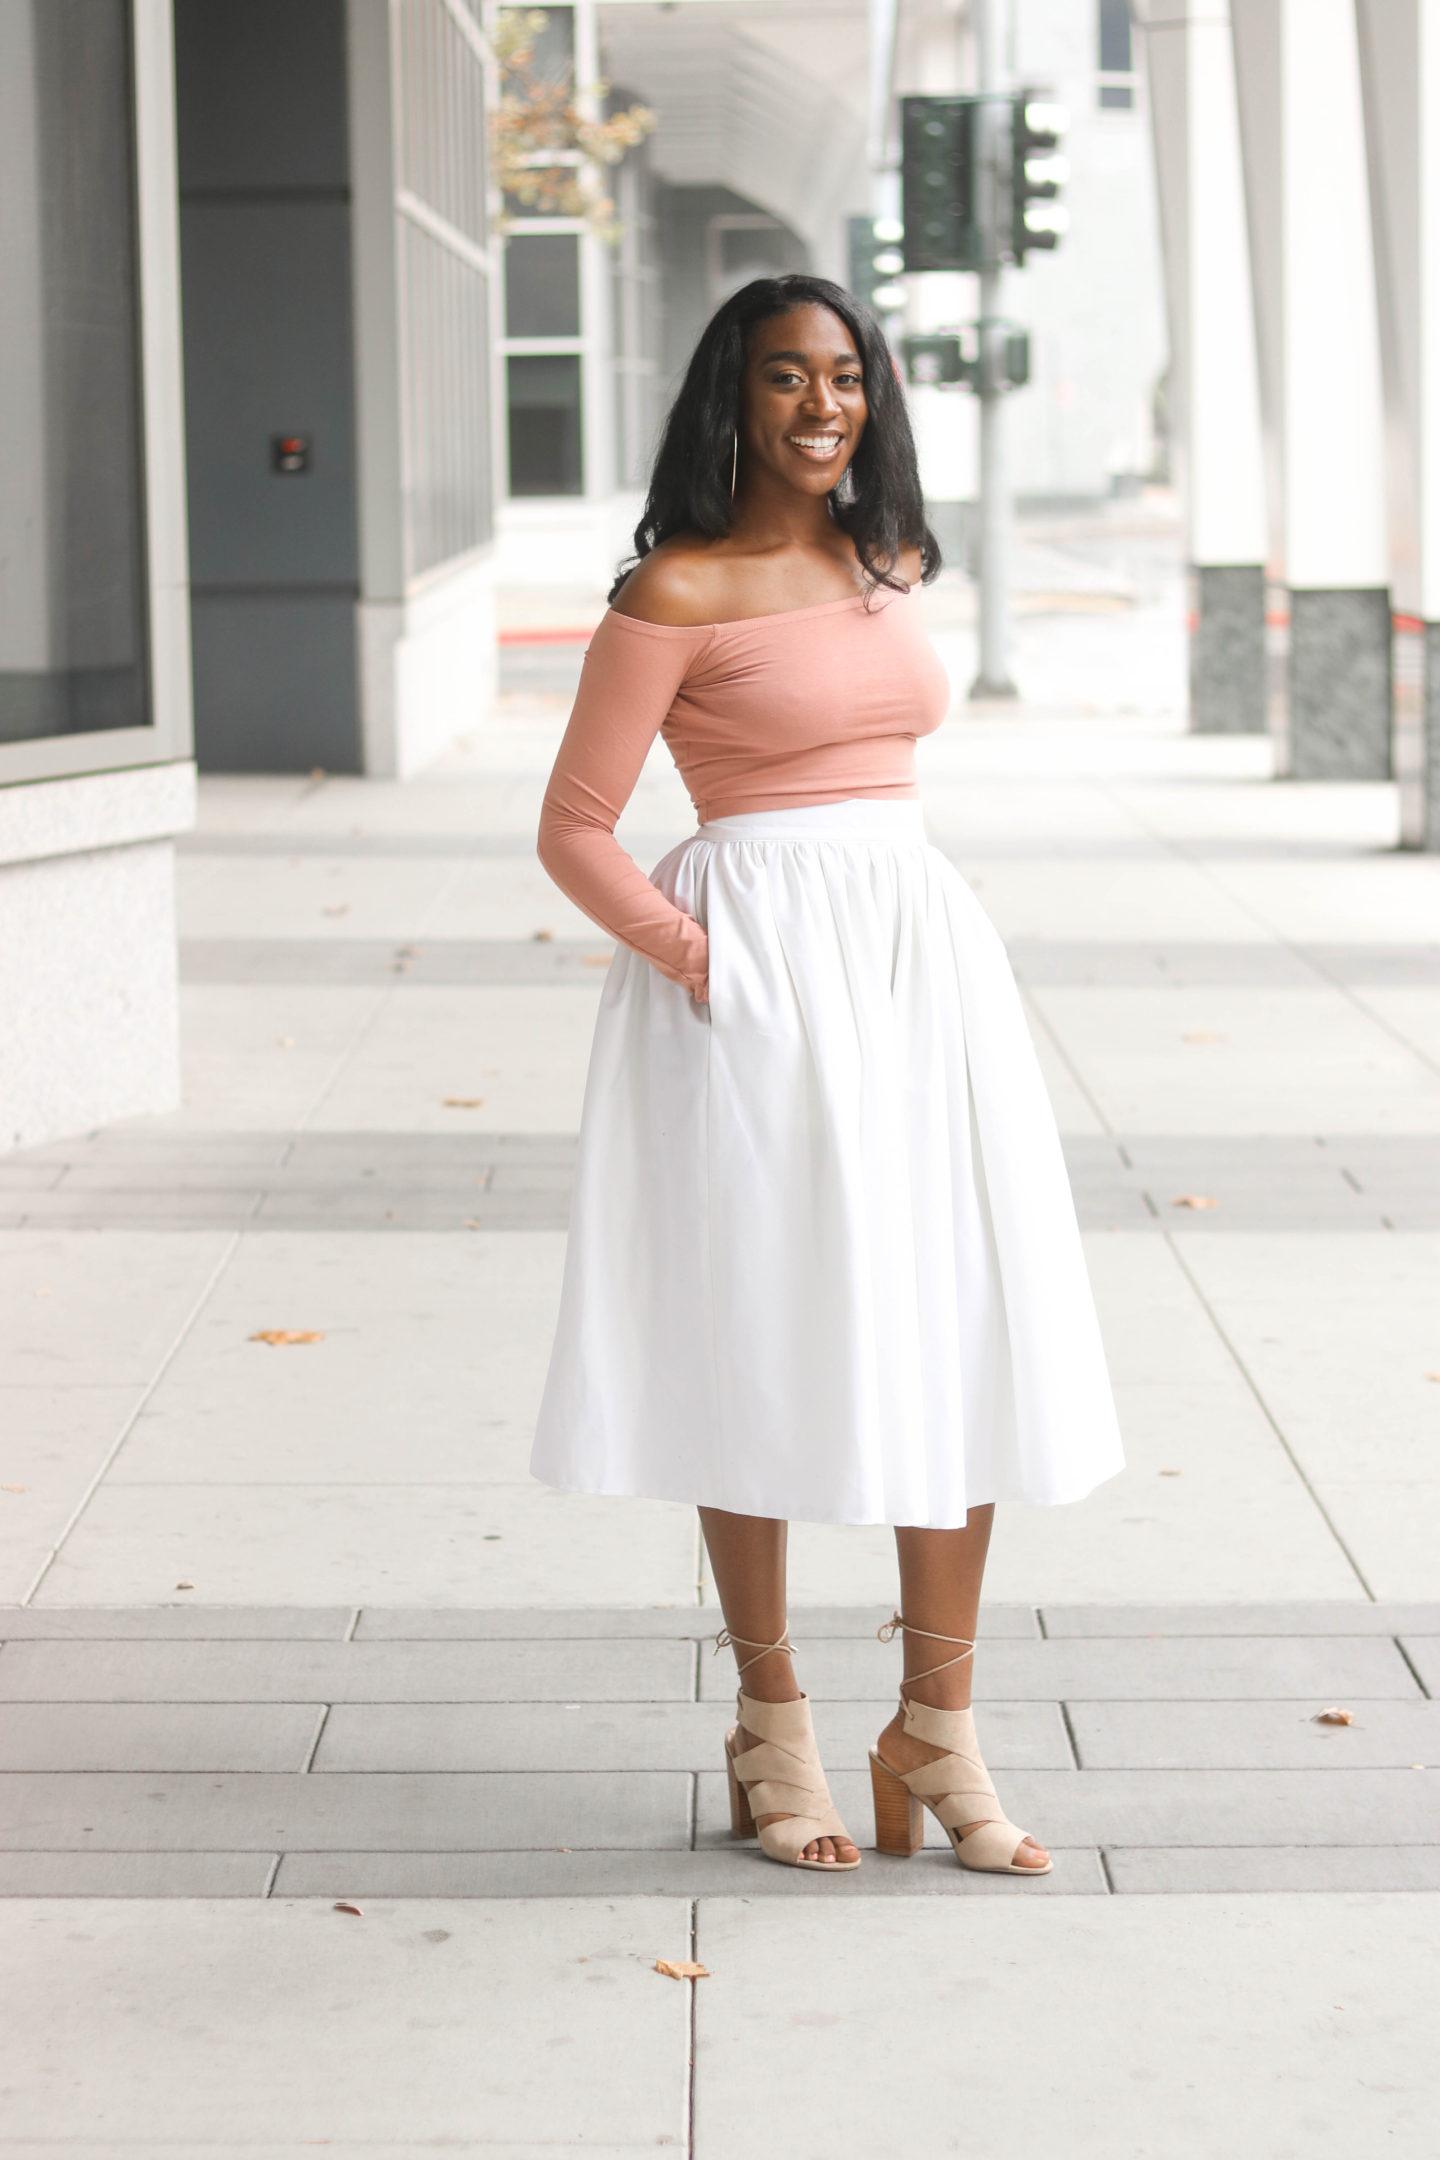 DIY White Denim Gathered Midi Skirt Tutorial , Sewing For Beginners, Sewing Tutorials, Skirt Tutorials, White Denim Skirt, DIY Fashion, Midi Skirt, Gathered skirt with pockets